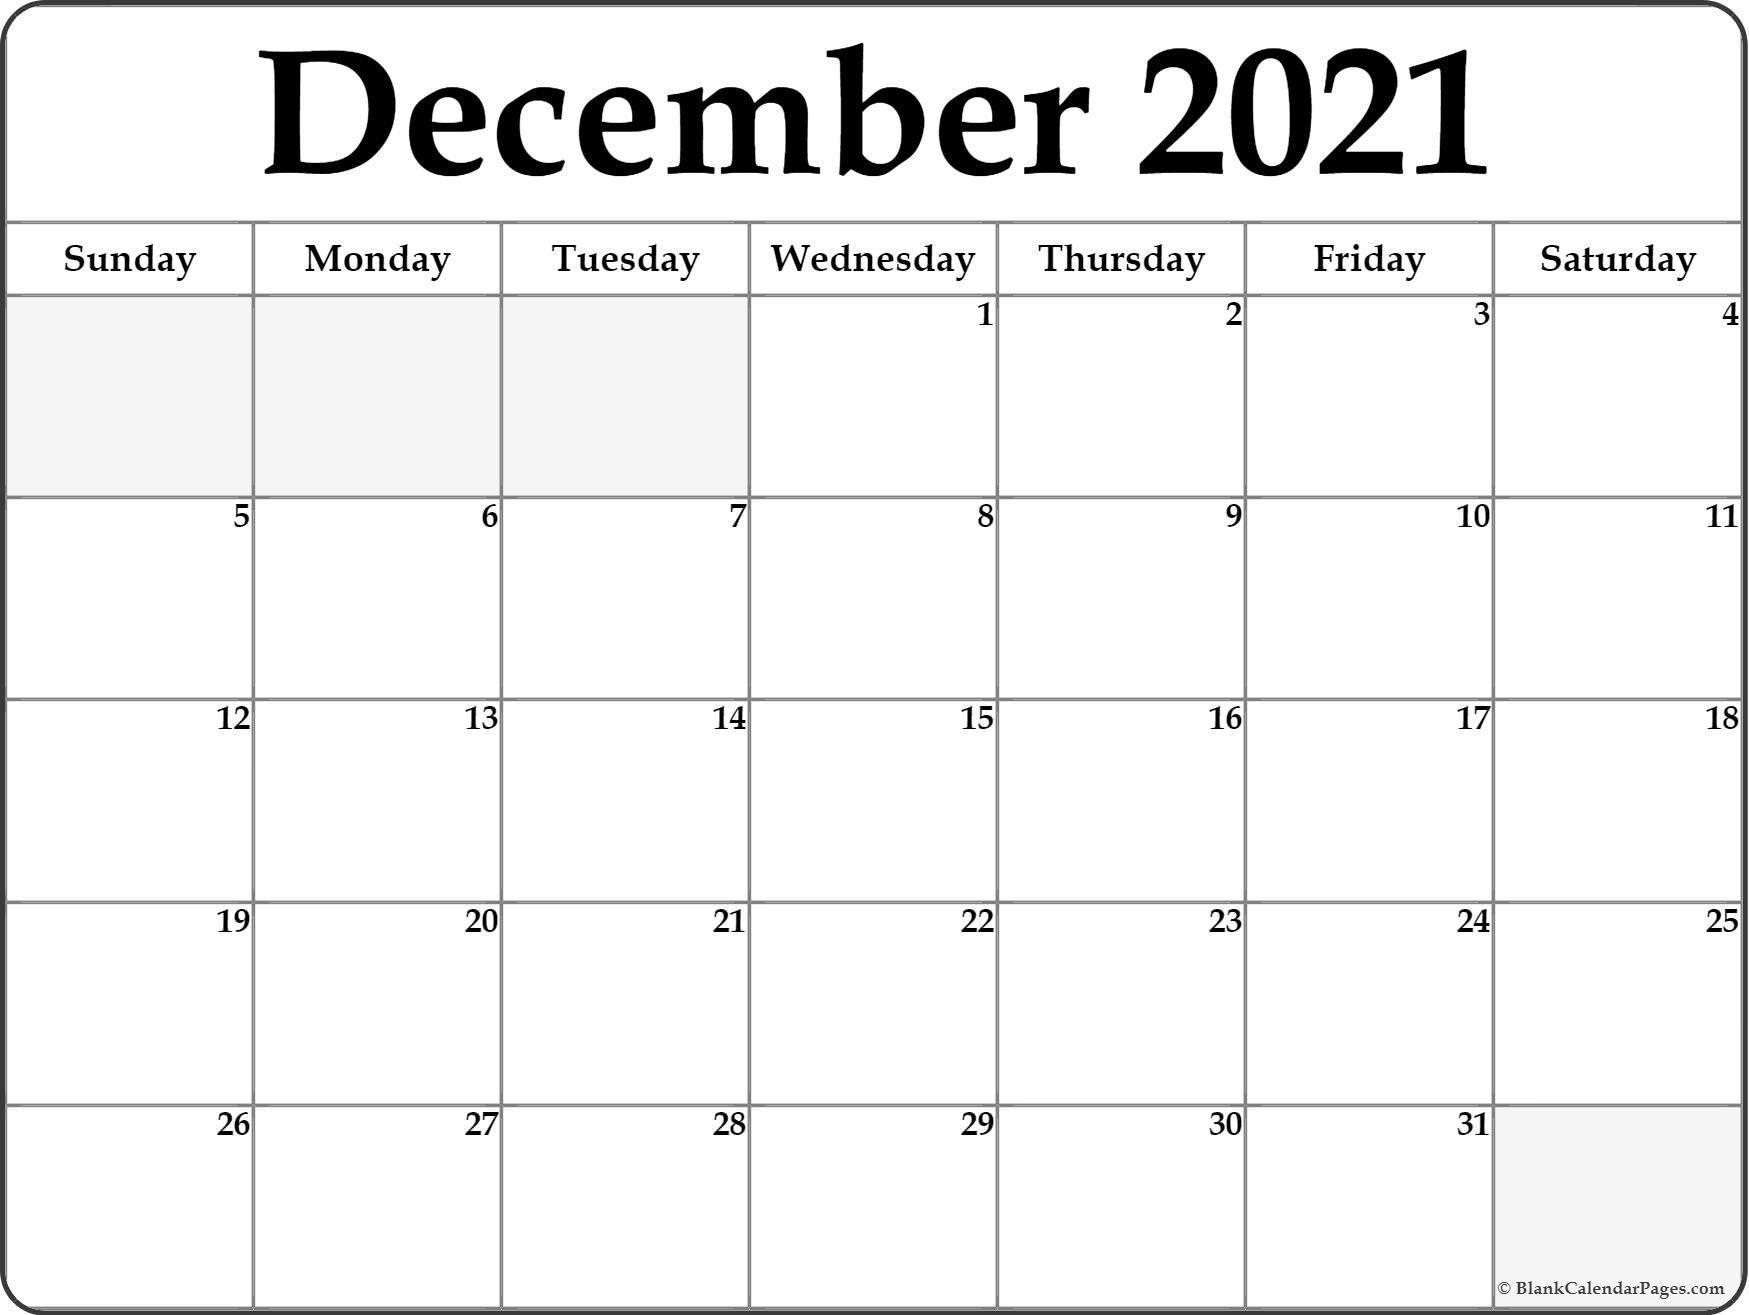 December 2021 Blank Calendar Templates December 2021 Blank with regard to September 2021 Calendar Printable